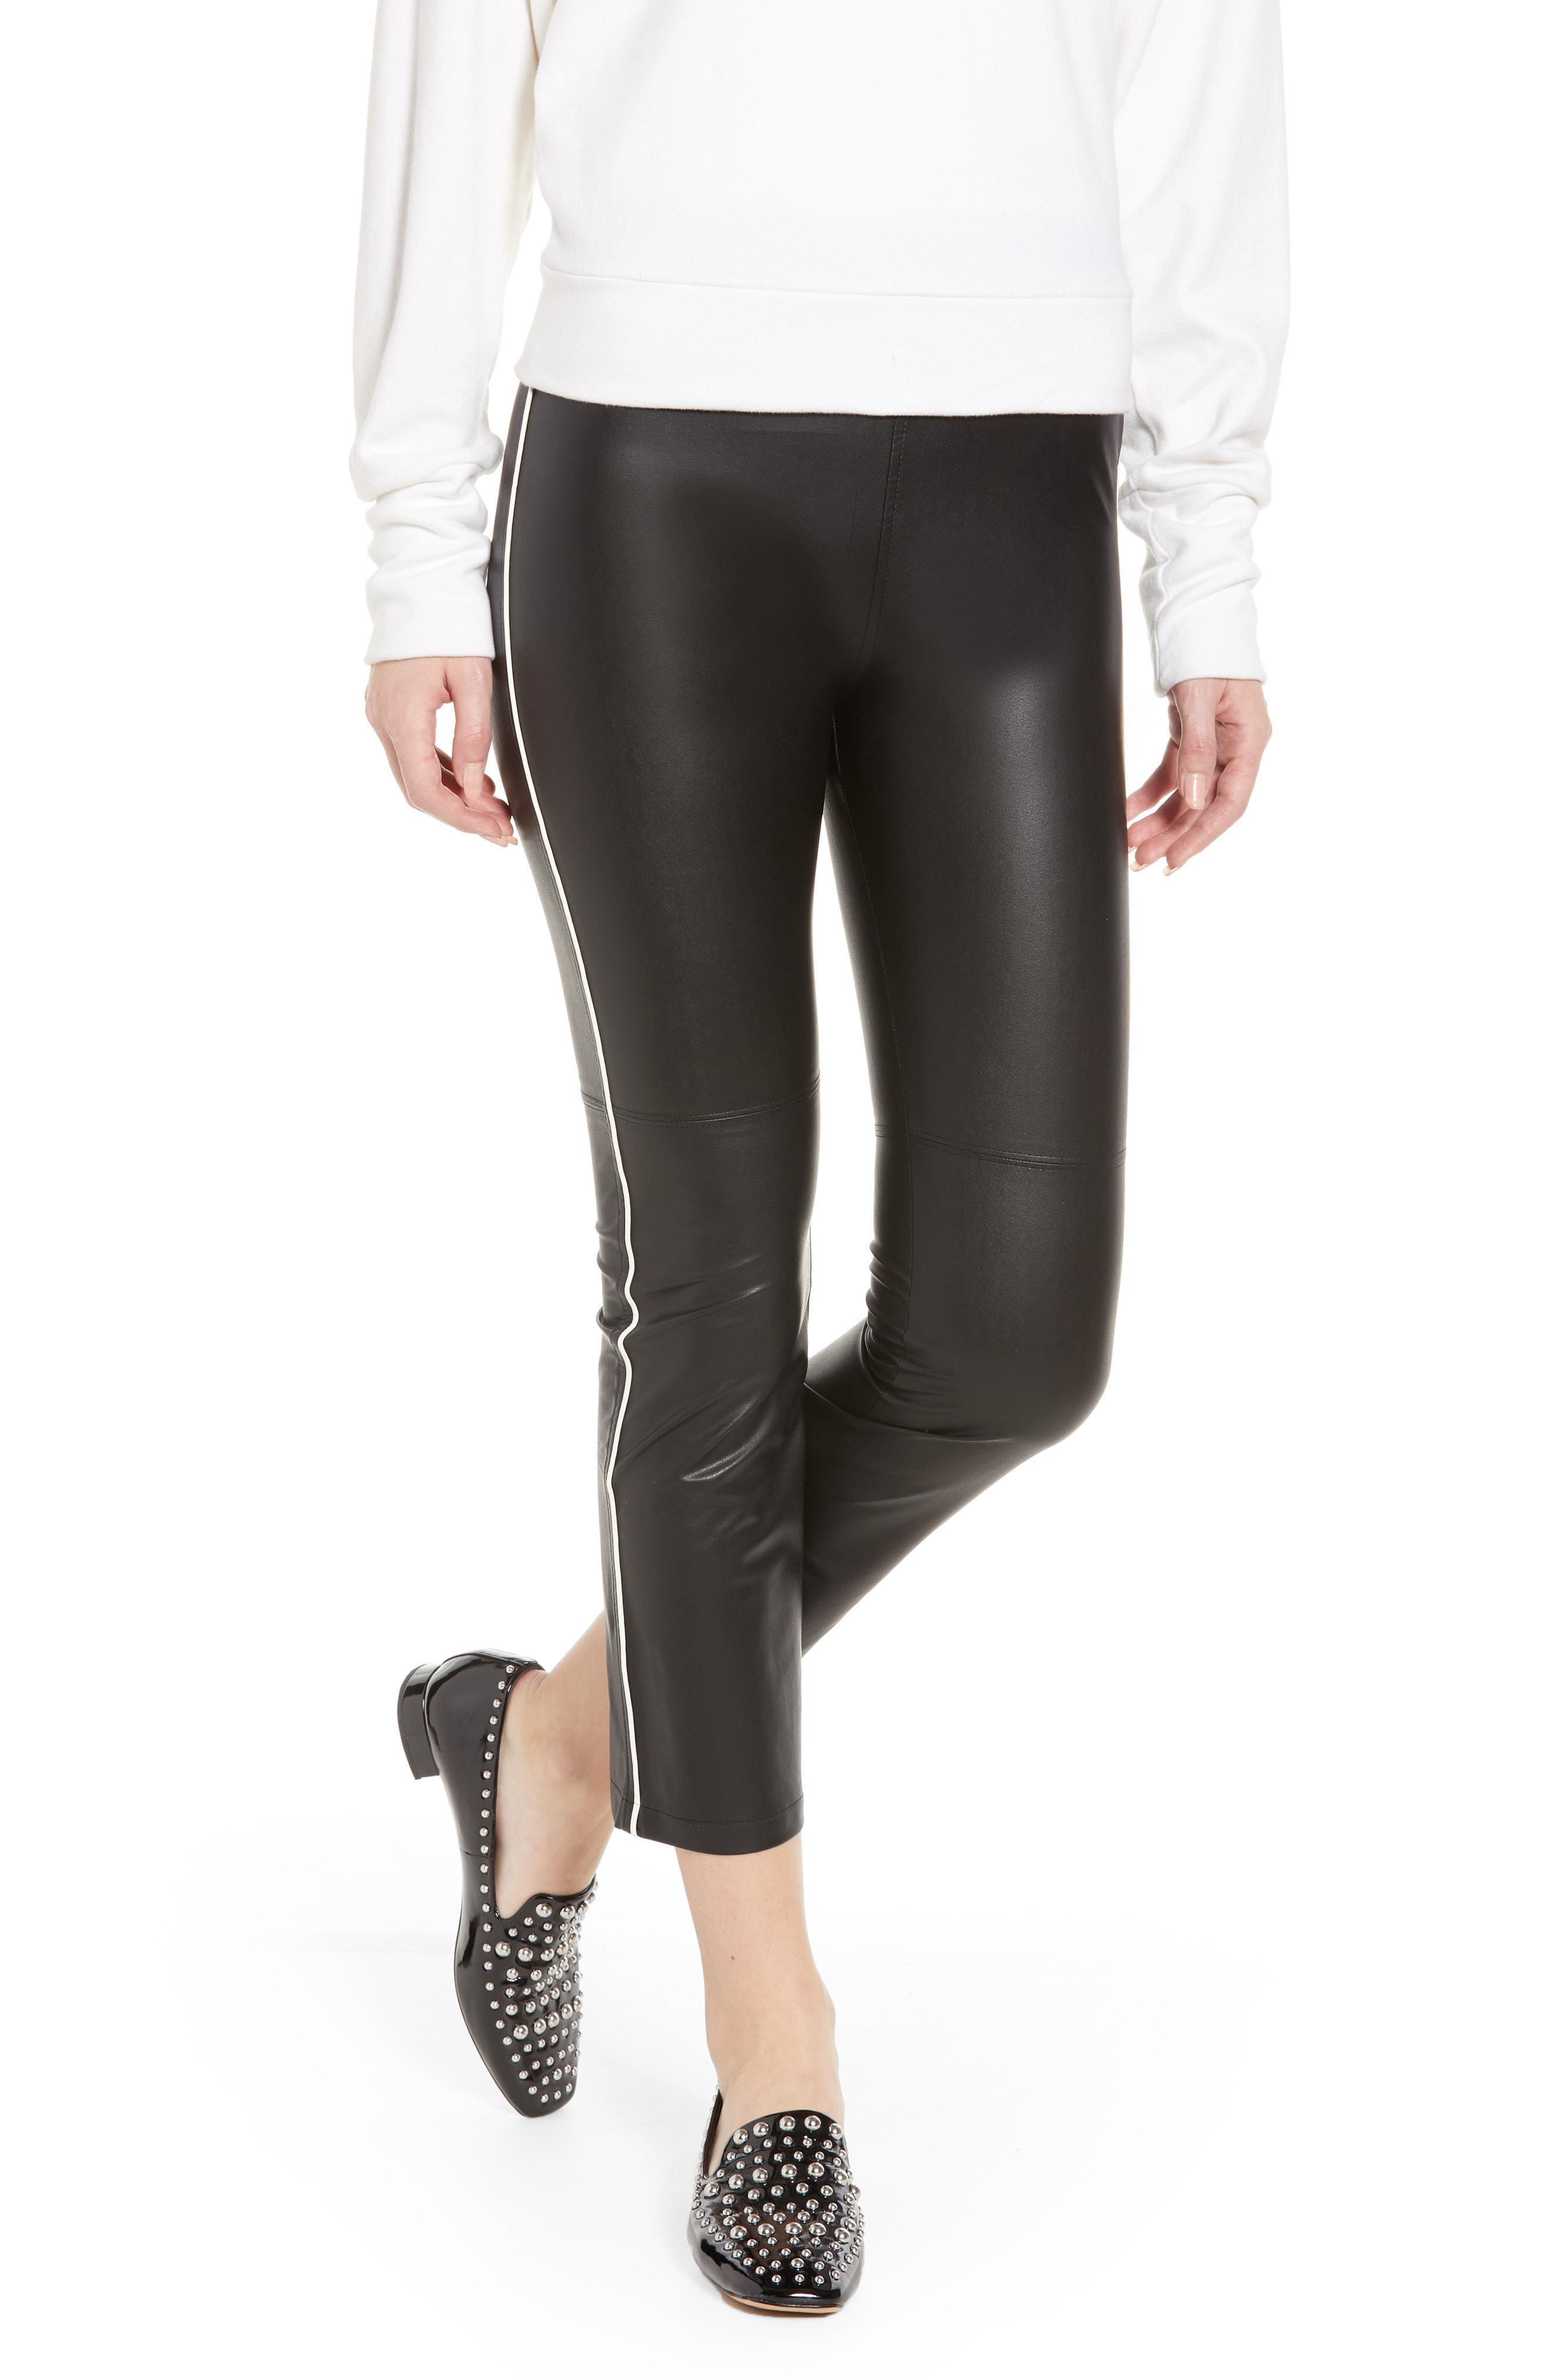 66494b64034f5 Lyst - David Lerner Gemma Faux Leather Skimmer Pants in Black